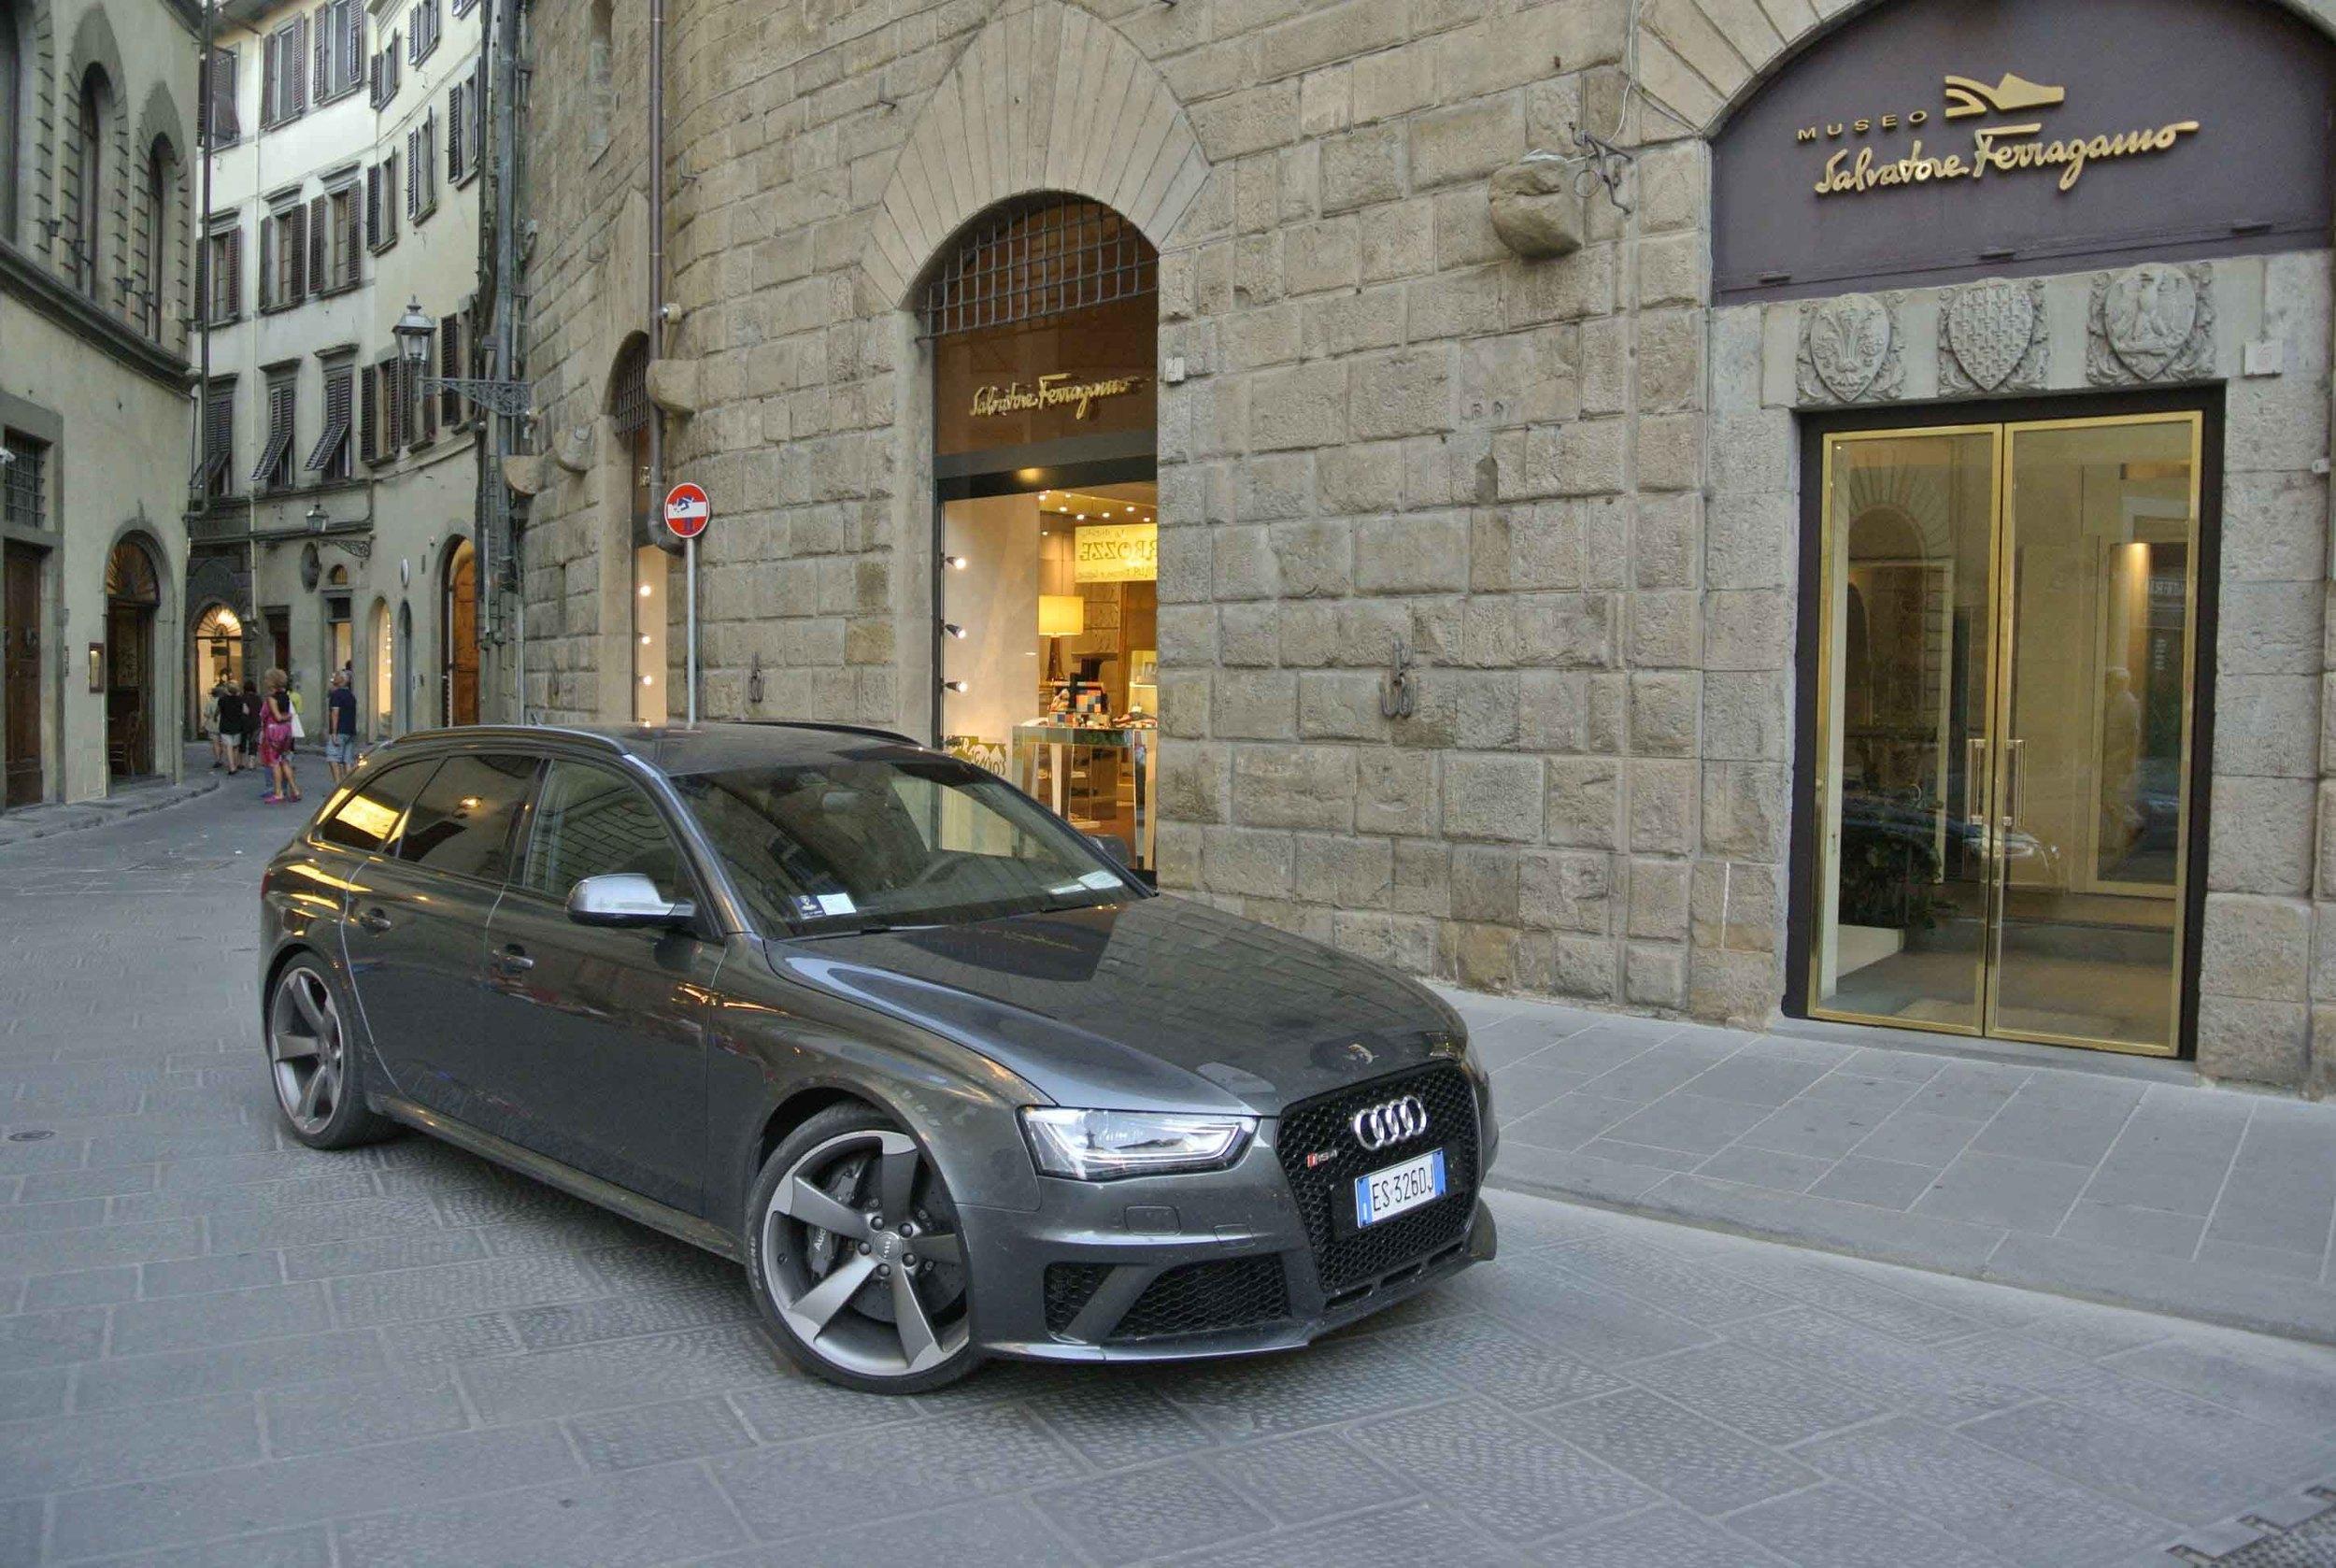 Audi RS4 Avant at the Ferragamo headquarters, Florence, Italy